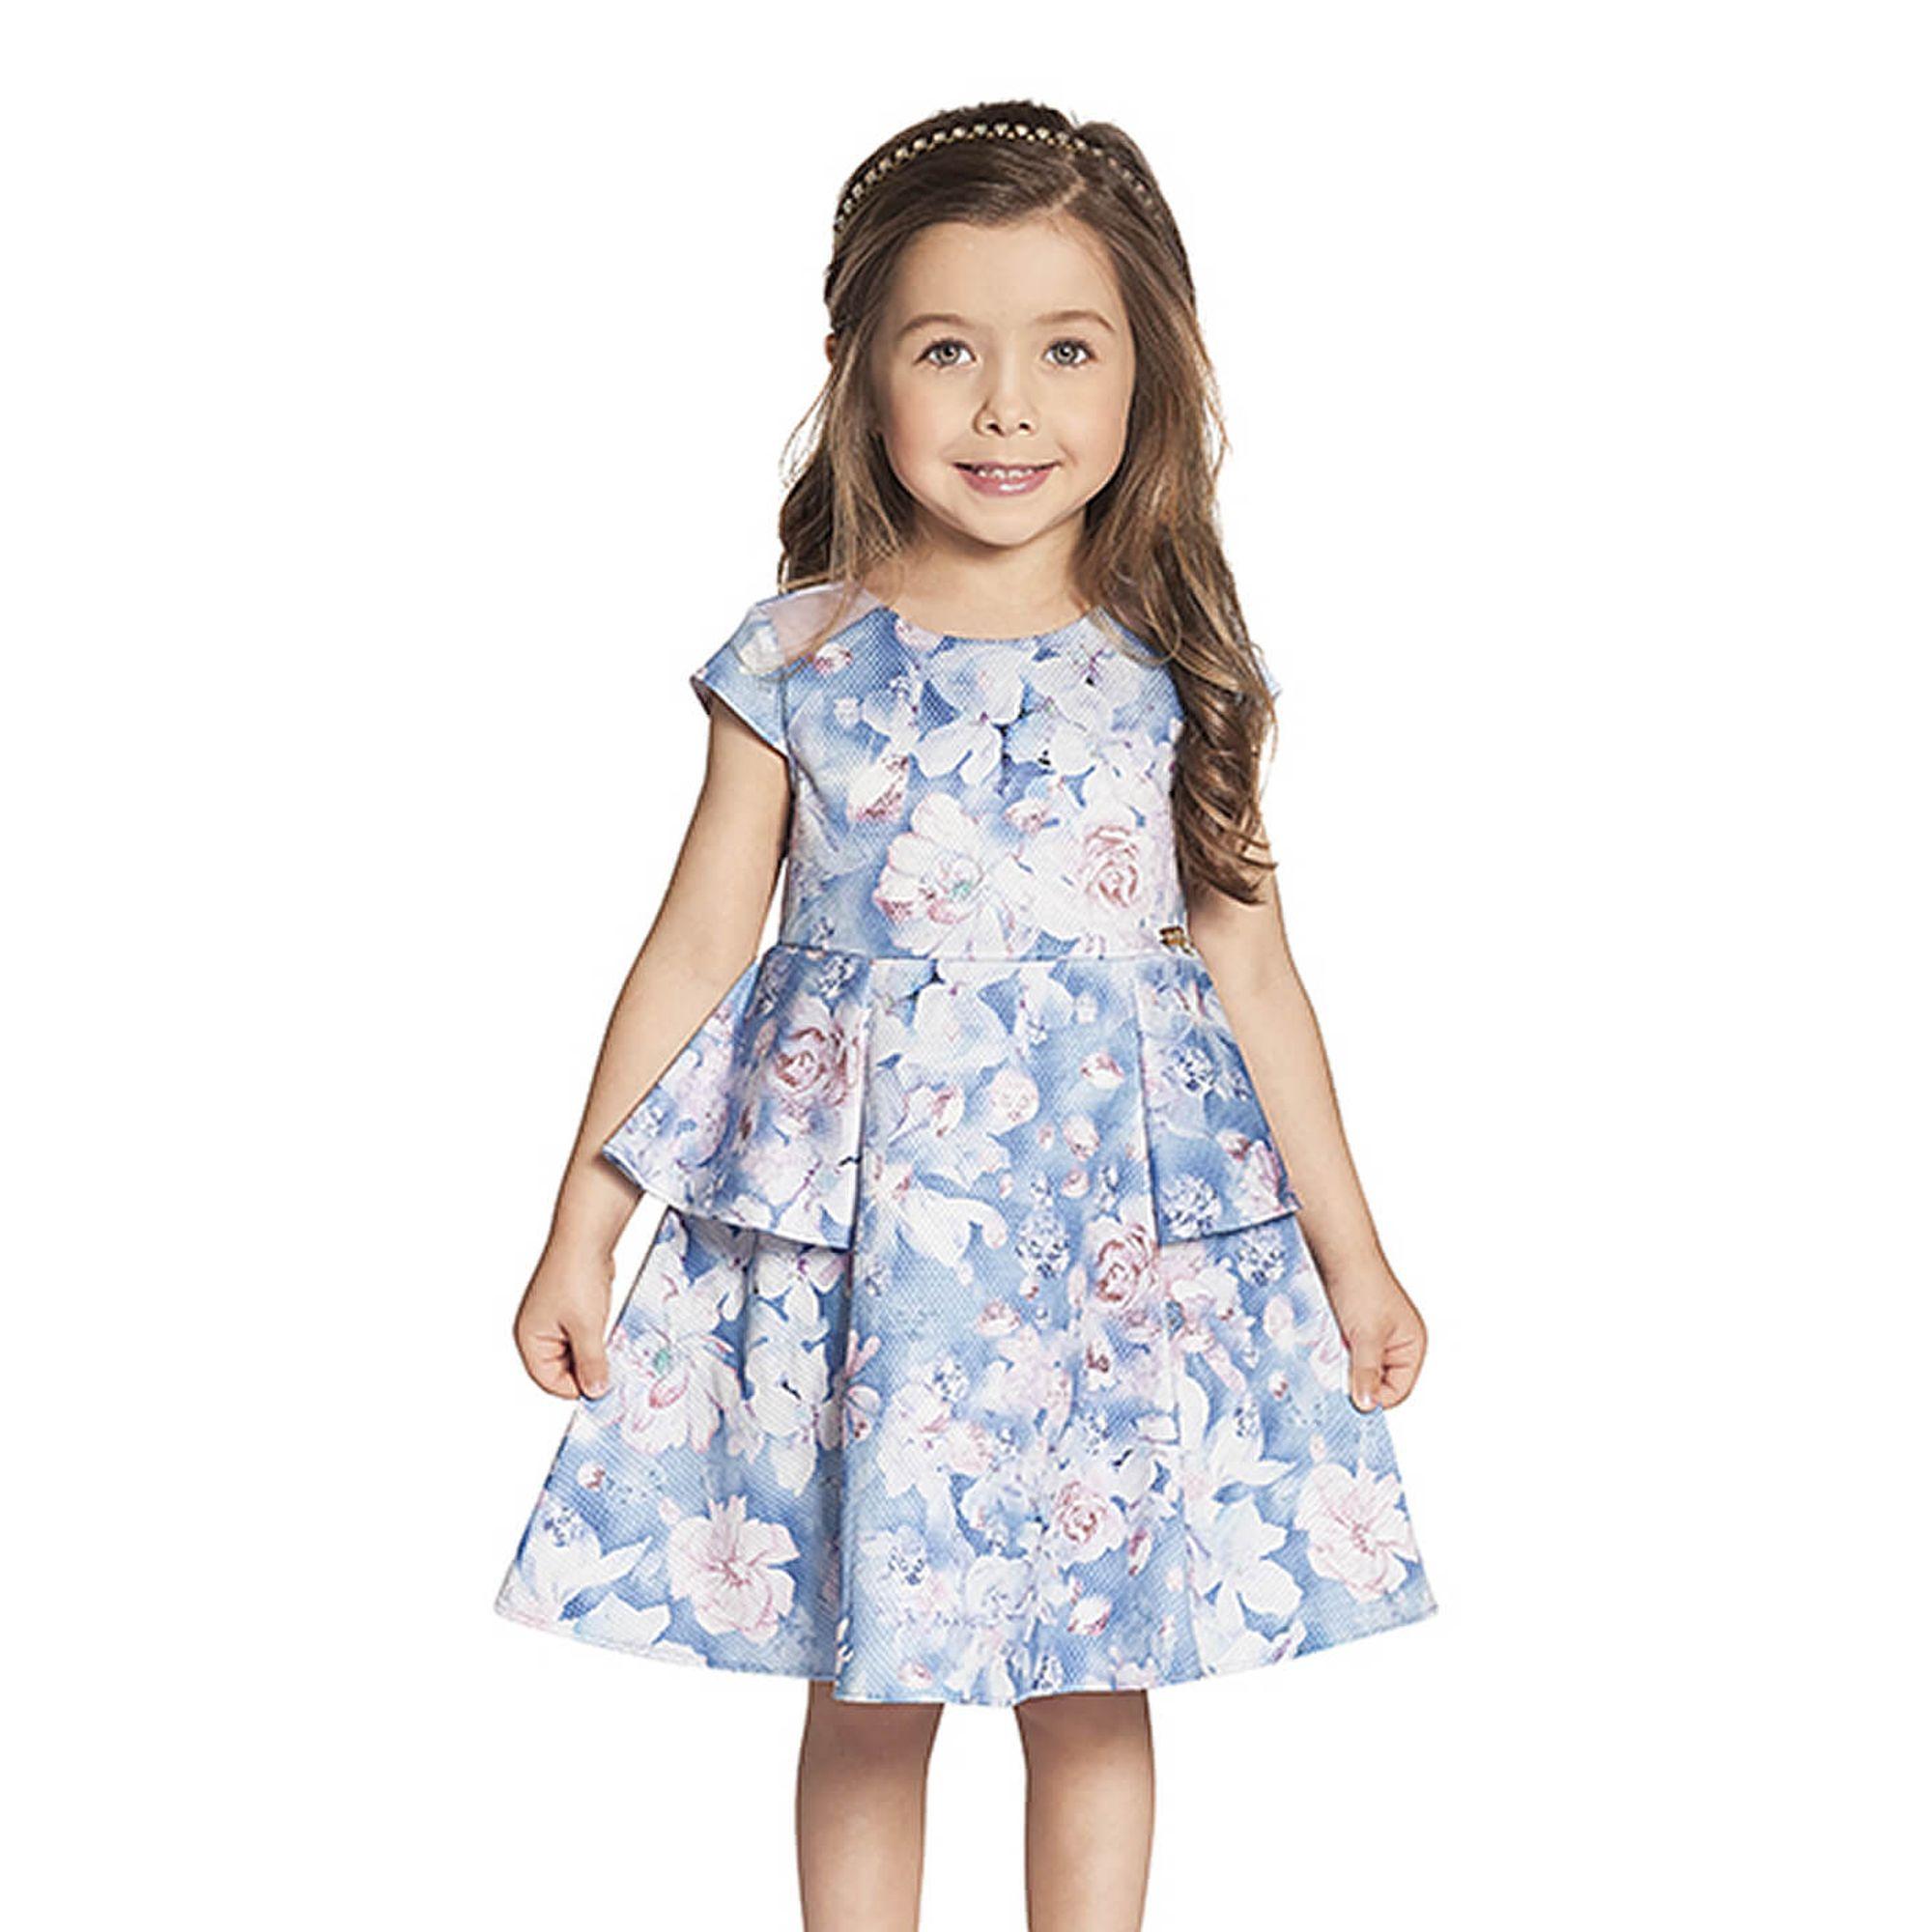 760d631d4790 Vestido Infantil Meia Manga Estampa Flores Azul Claro e Rosa - Ninali